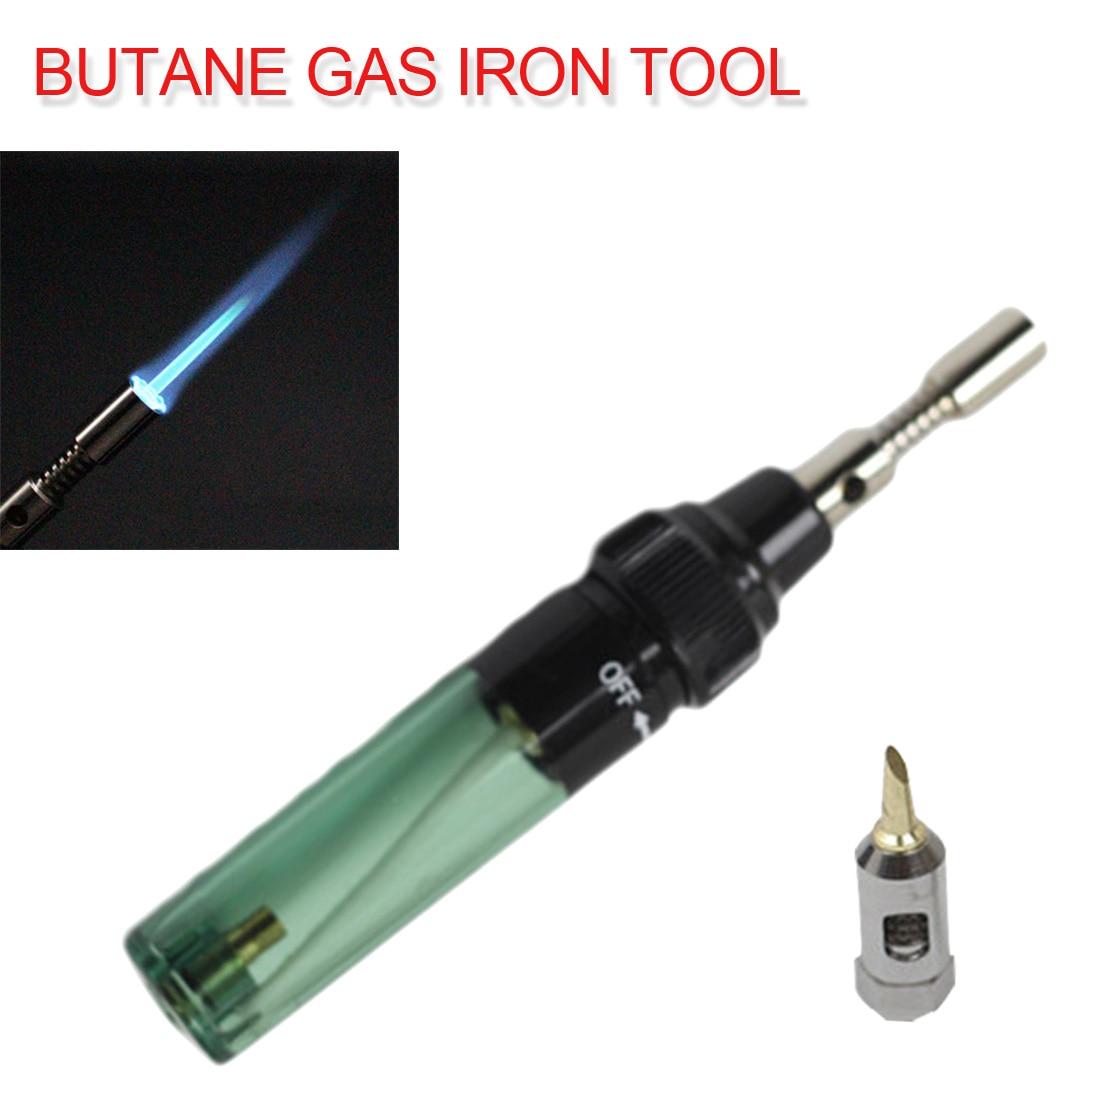 Butane Gas Soldering Solder Torch Iron Tool Pen Shaped Cordless Torch DIY/ Soldering Iron Pen Type Gas 3 In1 MT-100